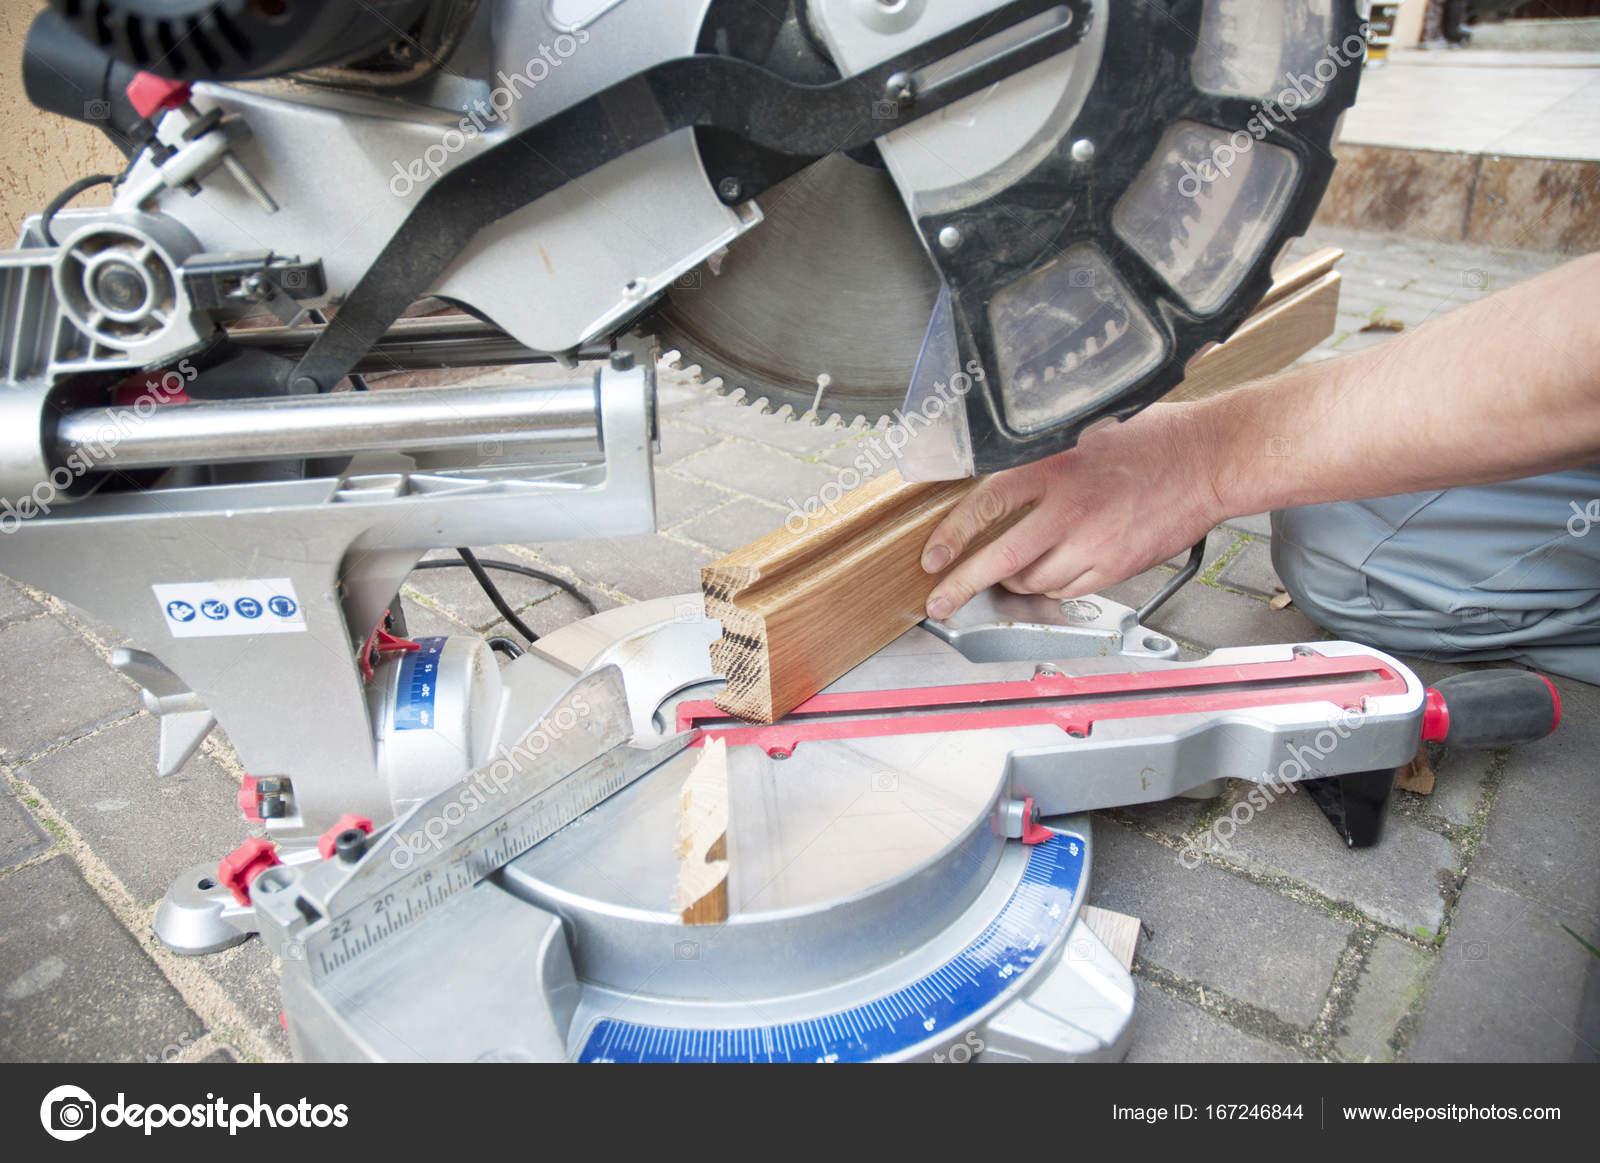 Fußbodenbelag Schneiden ~ Sockelleiste architrav auftragnehmer schneiden sockelleisten